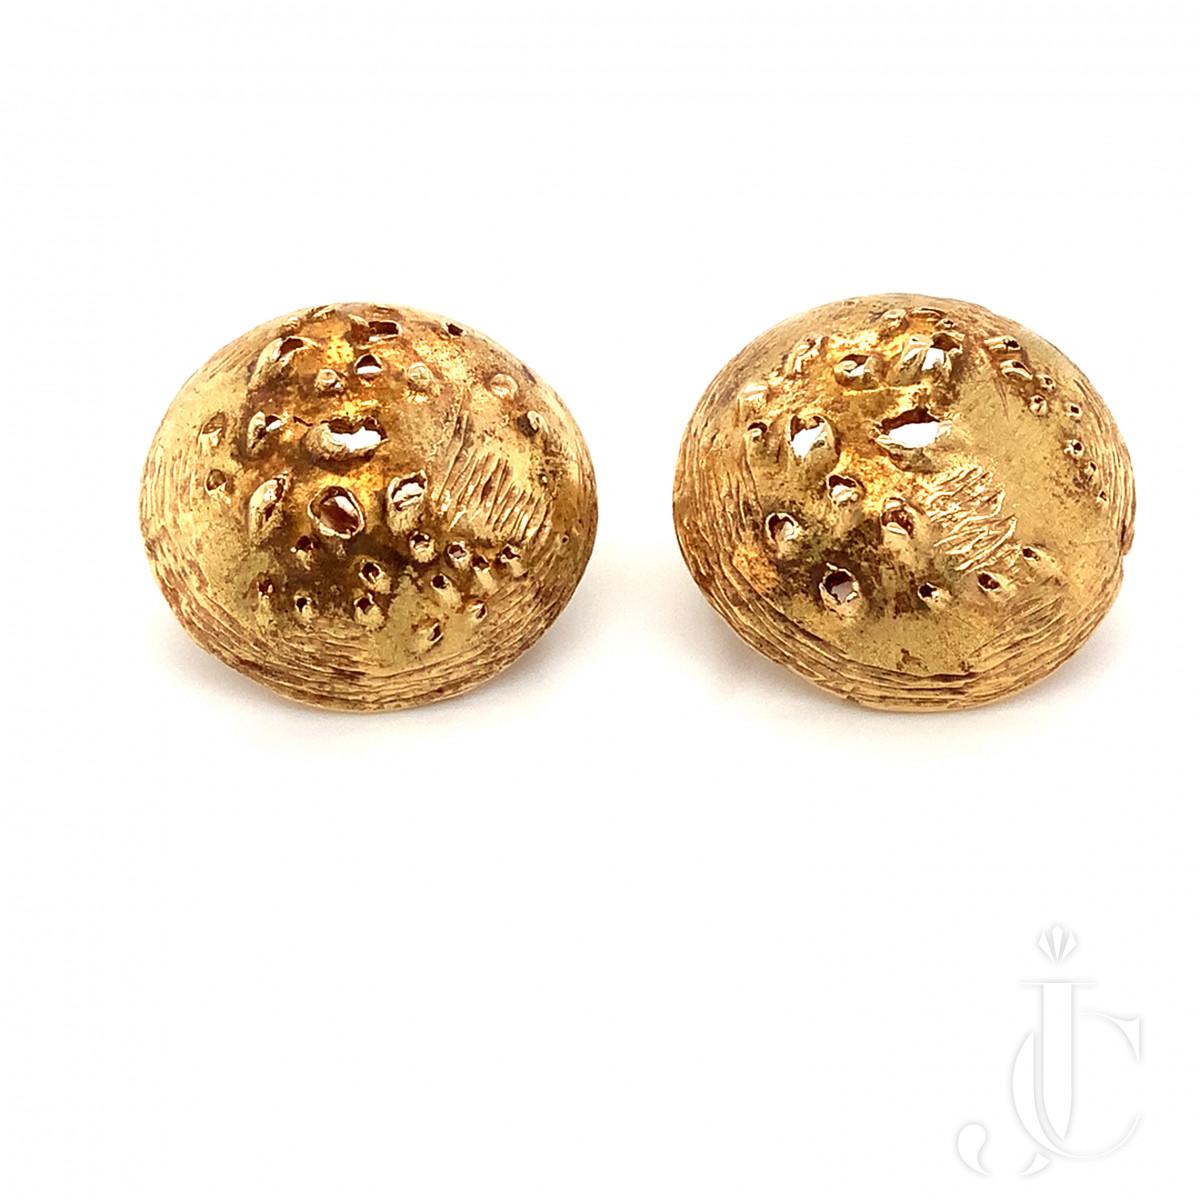 Gilbert Albert Gold Earrings